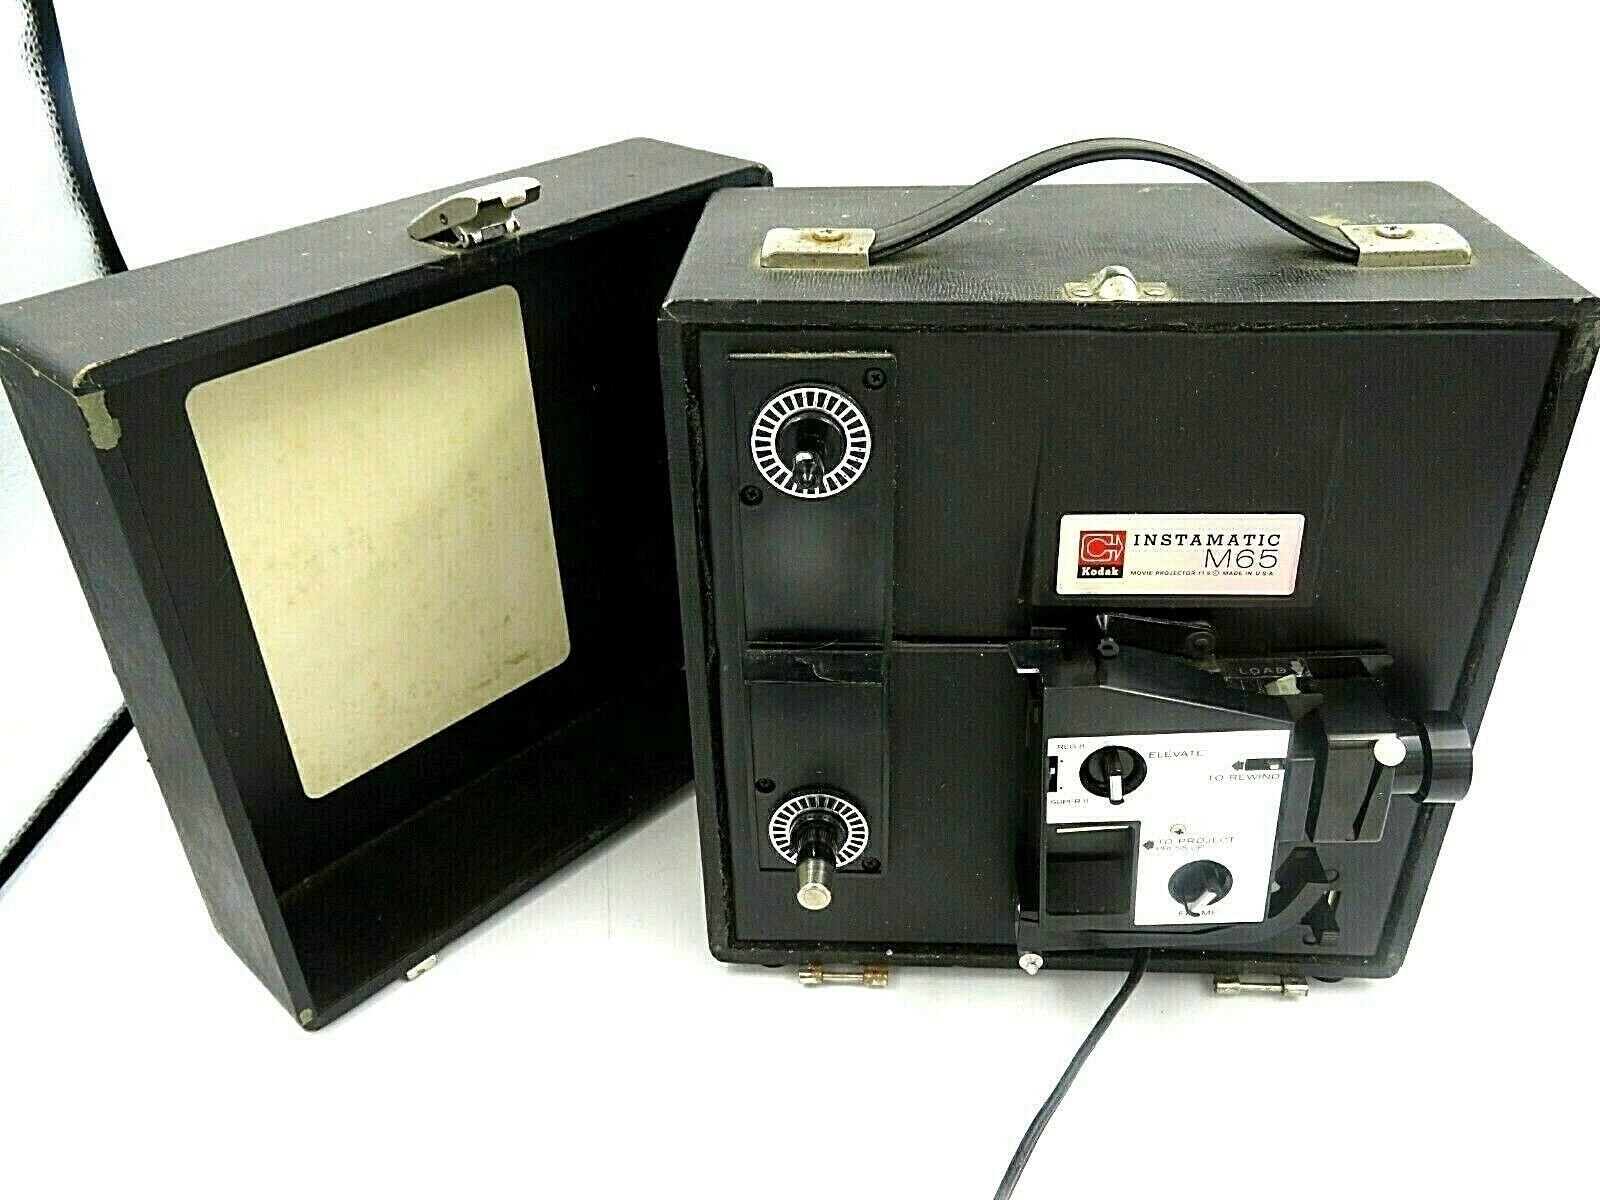 Vintage Kodak Instamatic M65 Movie Projector - $49.50